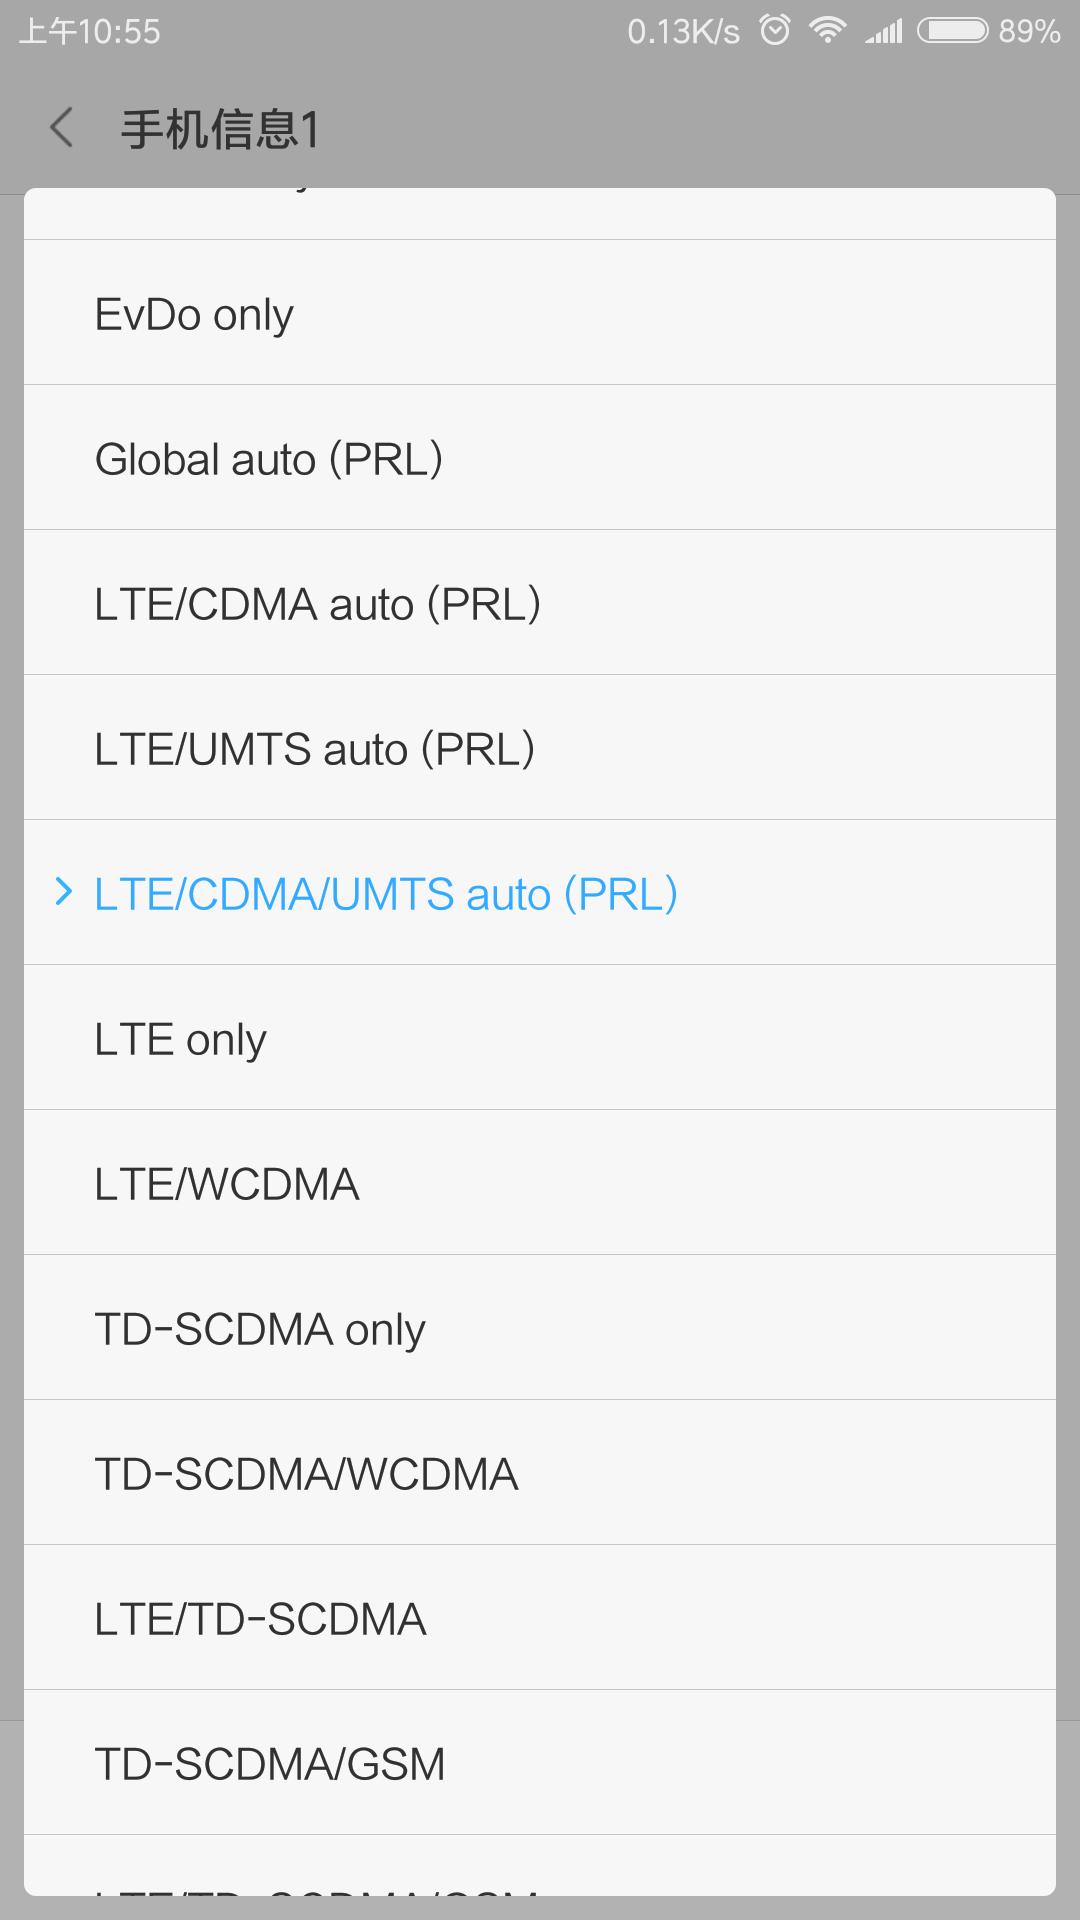 Screenshot_2017-09-26-10-55-00-289_com.android.se.png